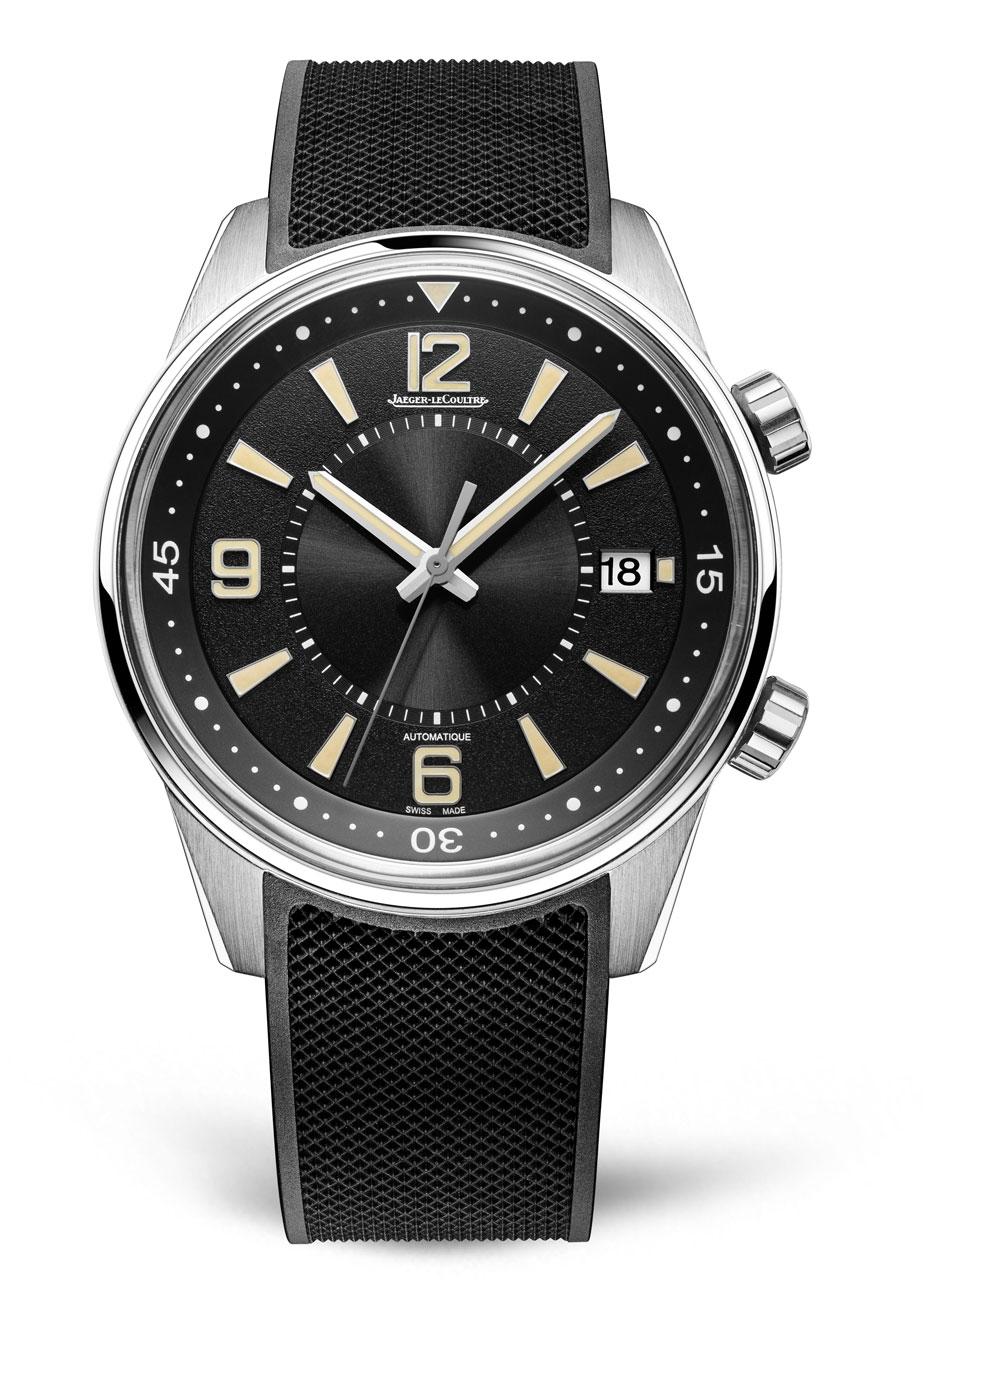 Reloj Jaeger-LeCoultre Polaris Date